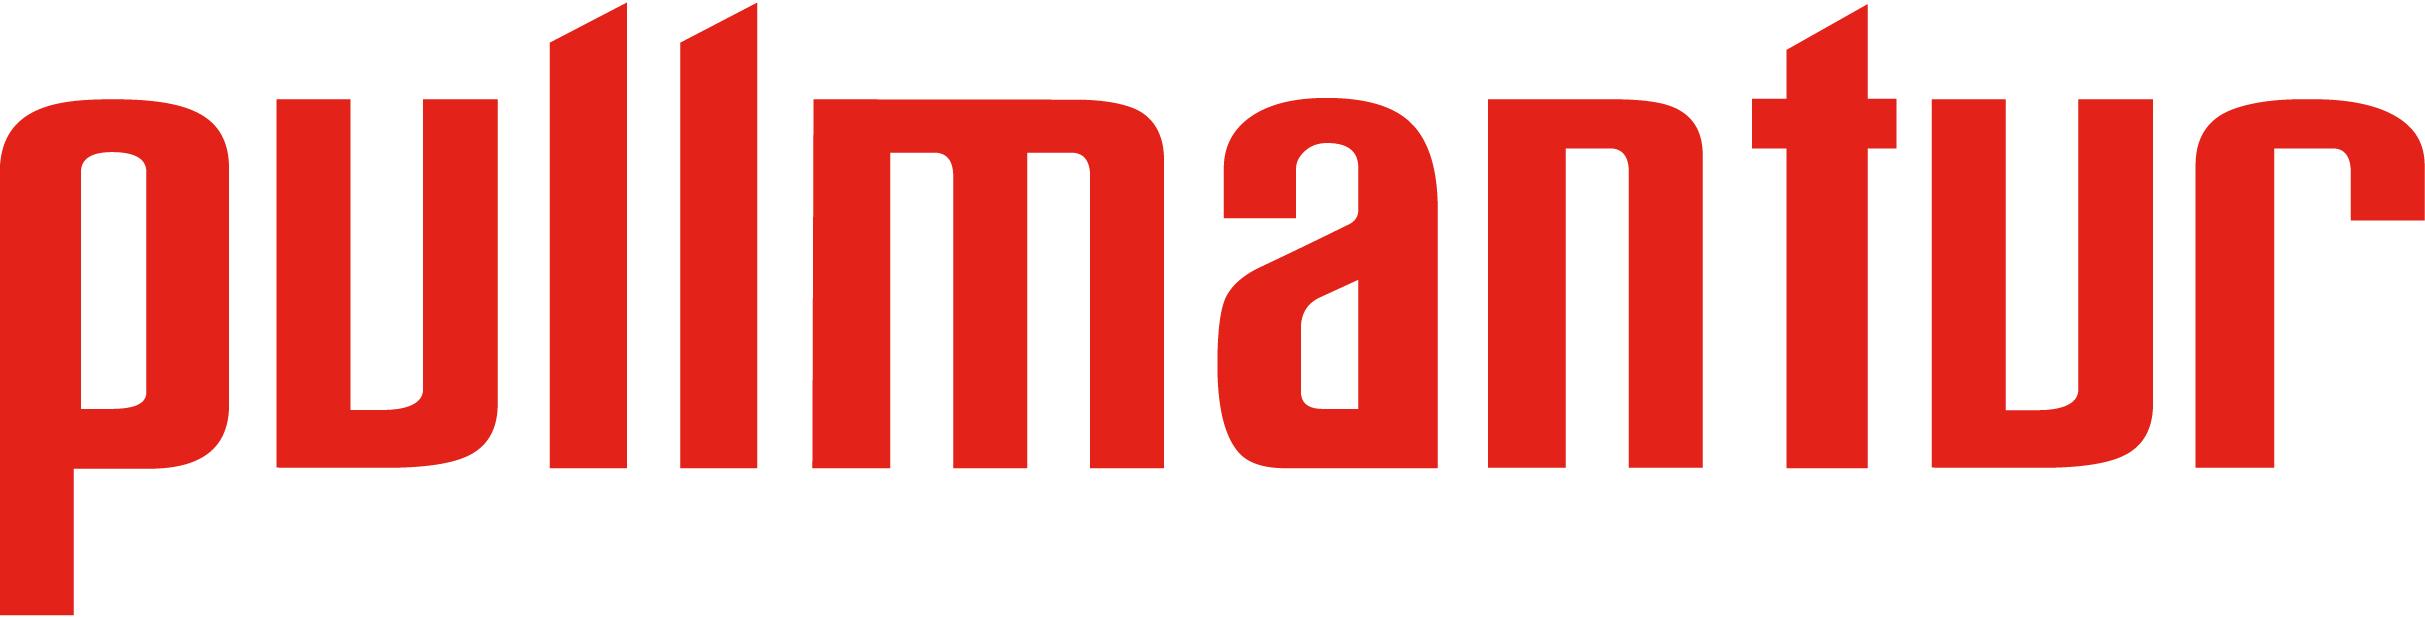 LogoPullmantur08